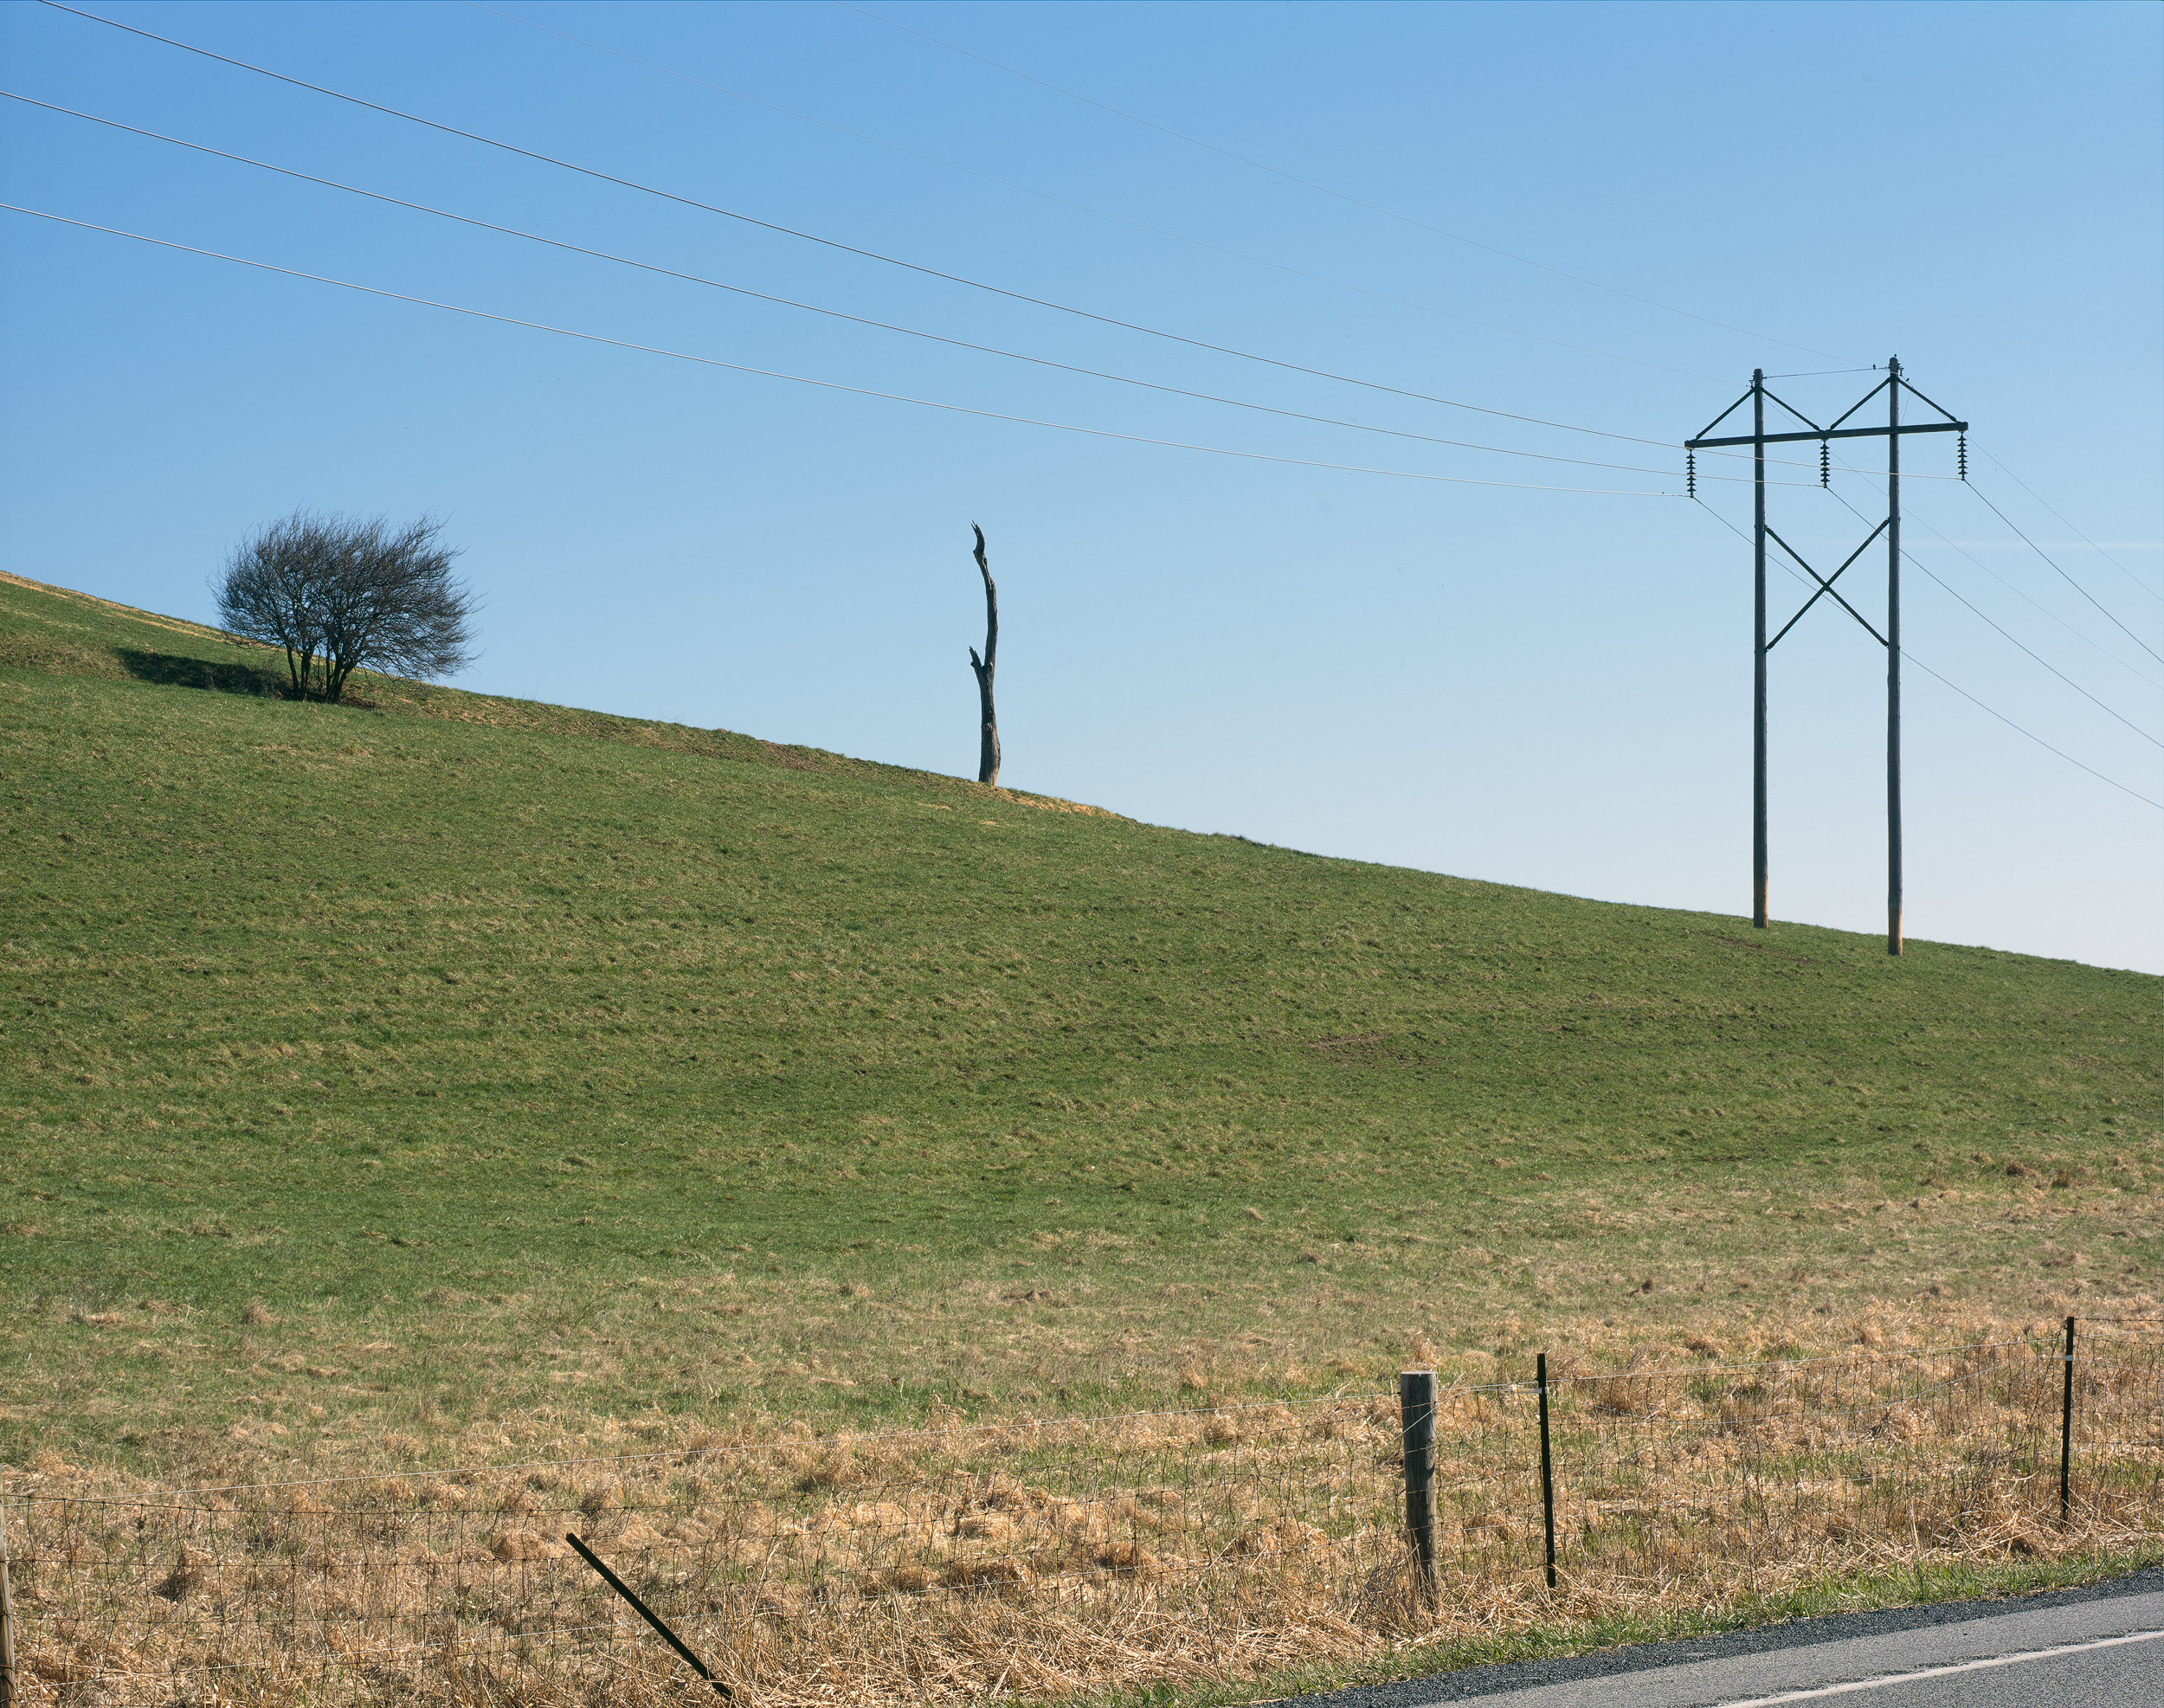 Lincoln Highway (US 30), Pennsylvania